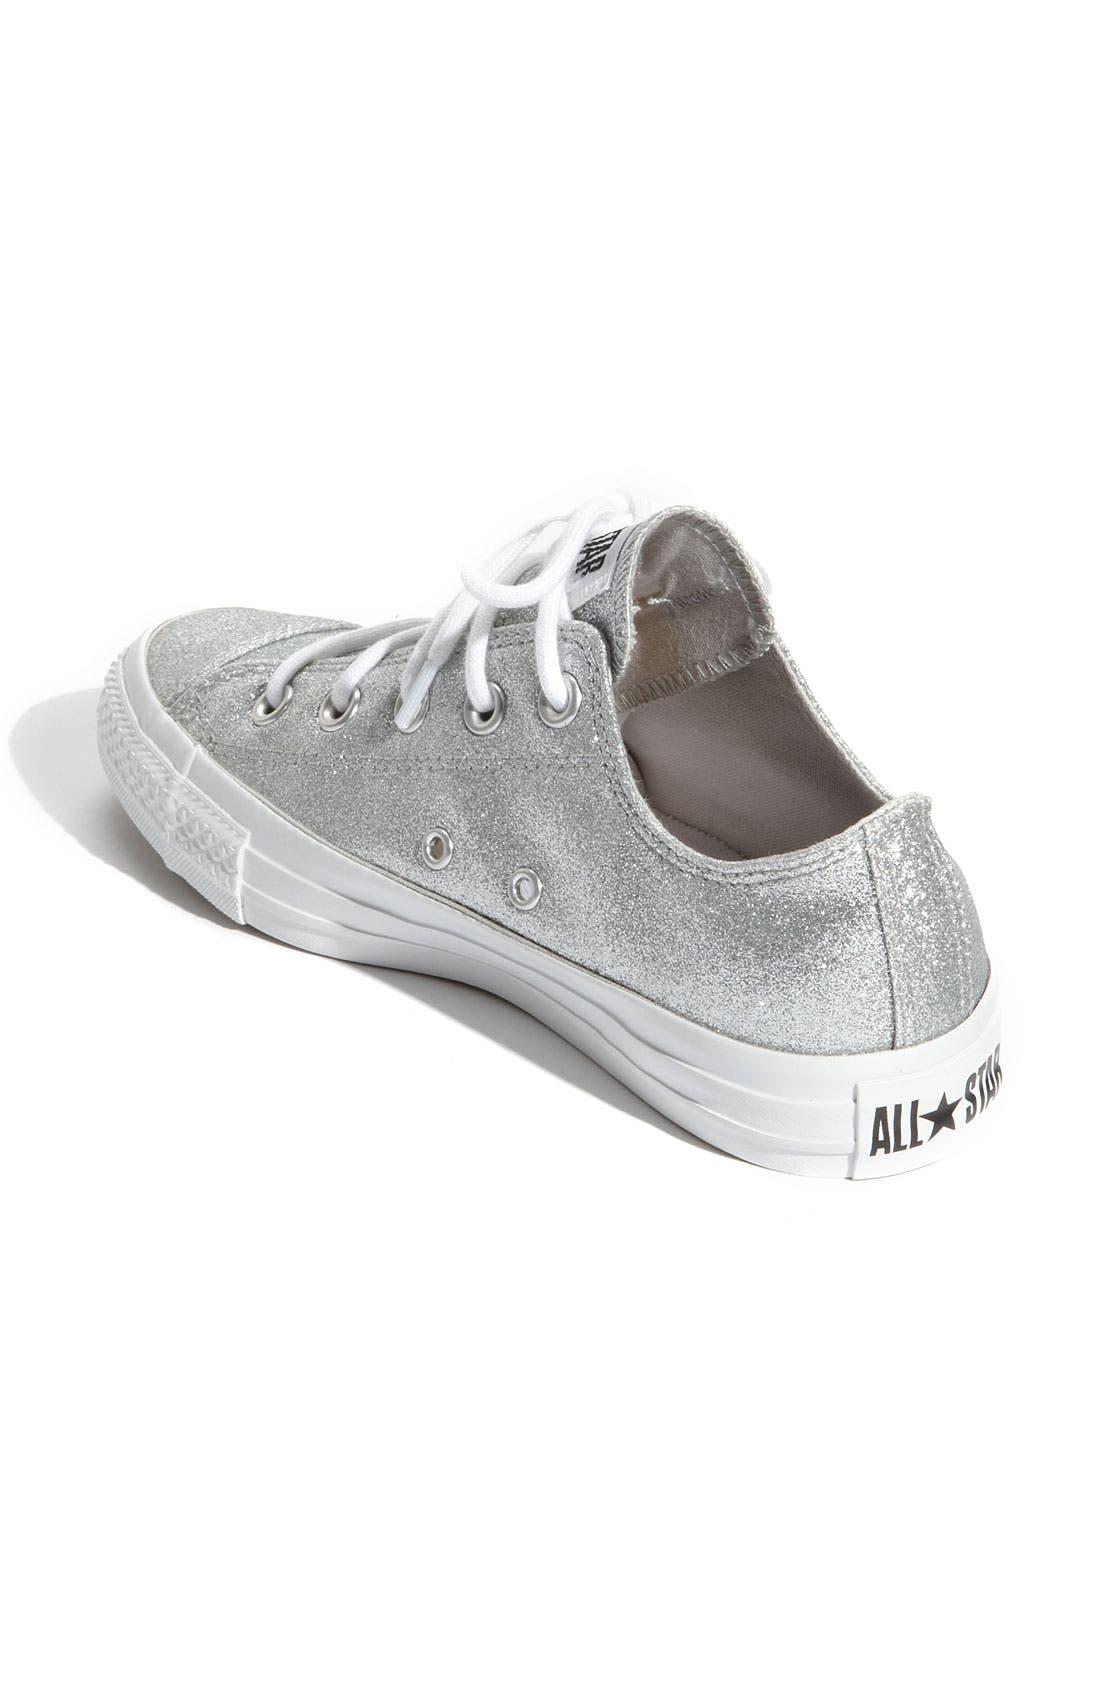 Chuck Taylor<sup>®</sup> 'Winter Glitz' Sneaker,                             Alternate thumbnail 2, color,                             Silver